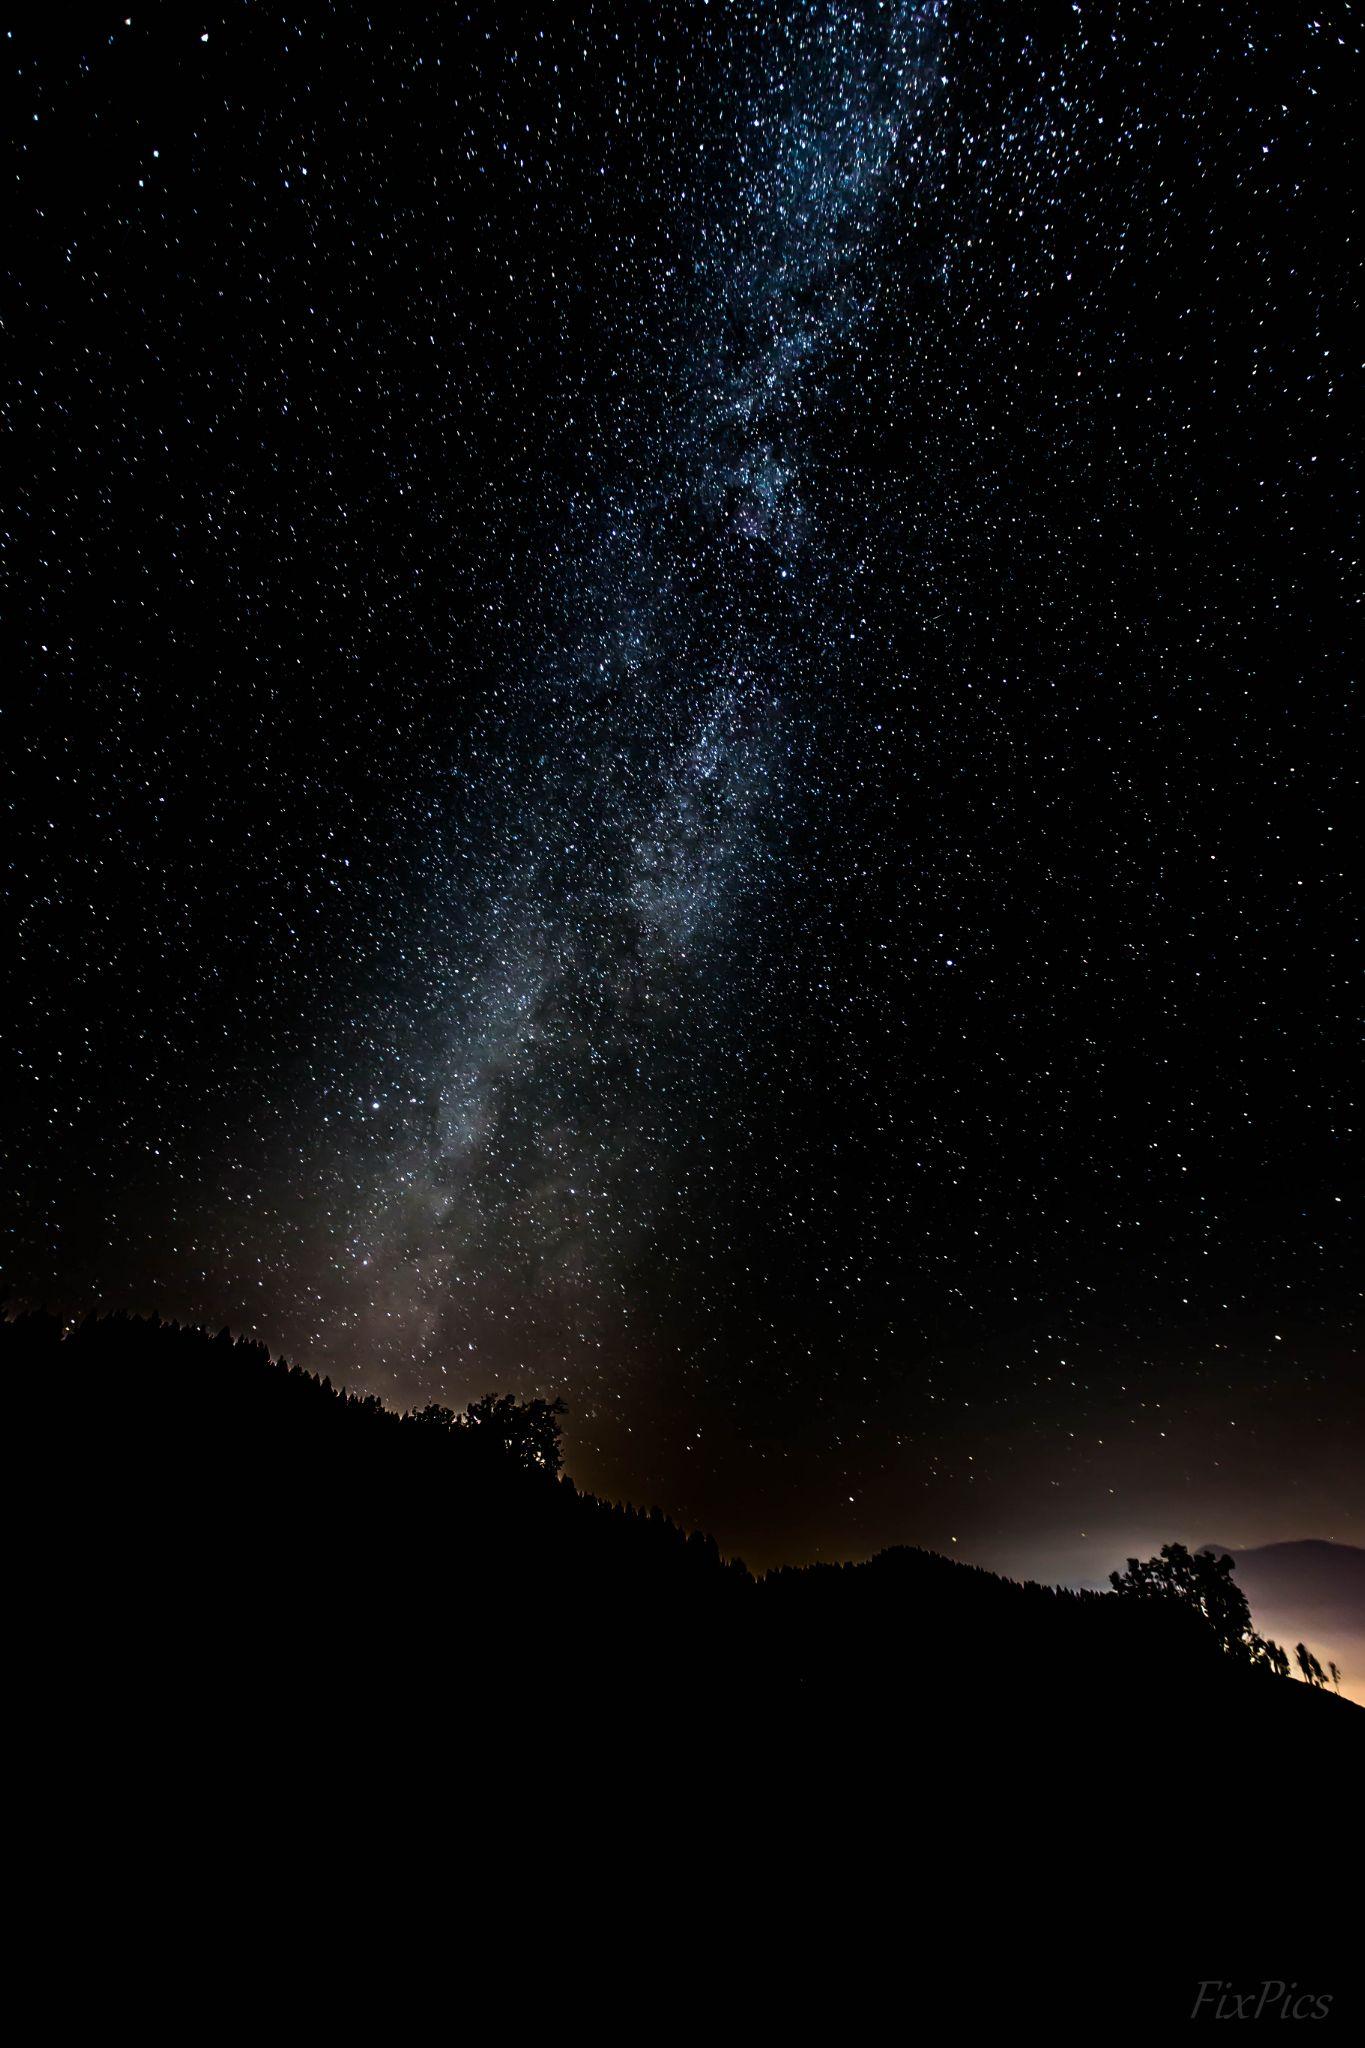 the galaxy tour by Martin Kriebernegg